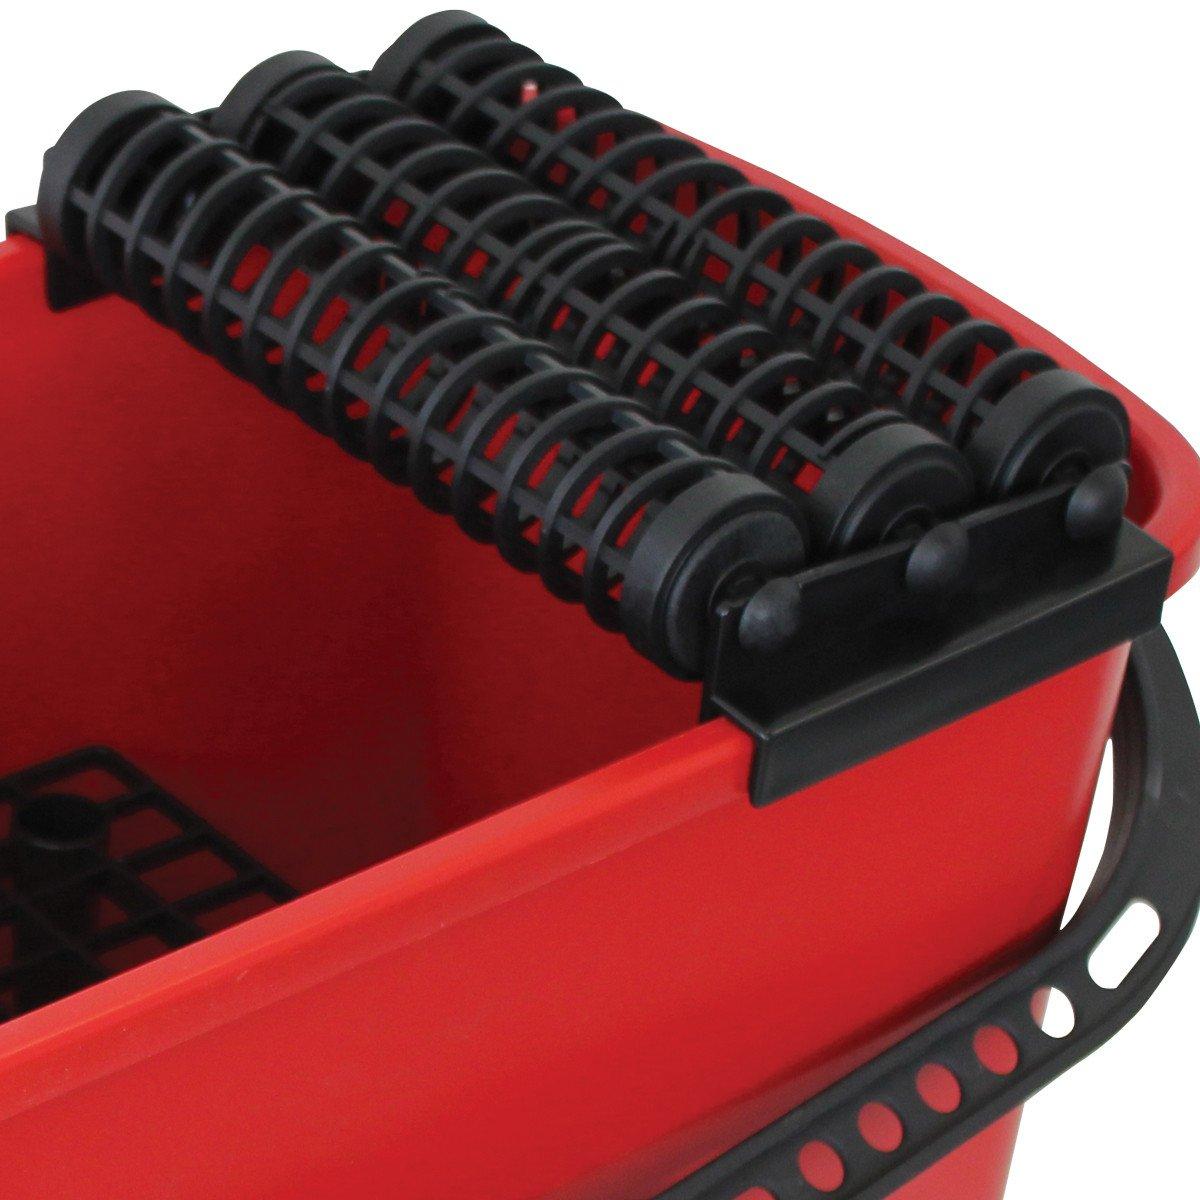 Rubi Tools Rubiclean Triple Wash Bucket Includes 1 Interchangeable Sponge With Handle by Rubi Tools (Image #3)